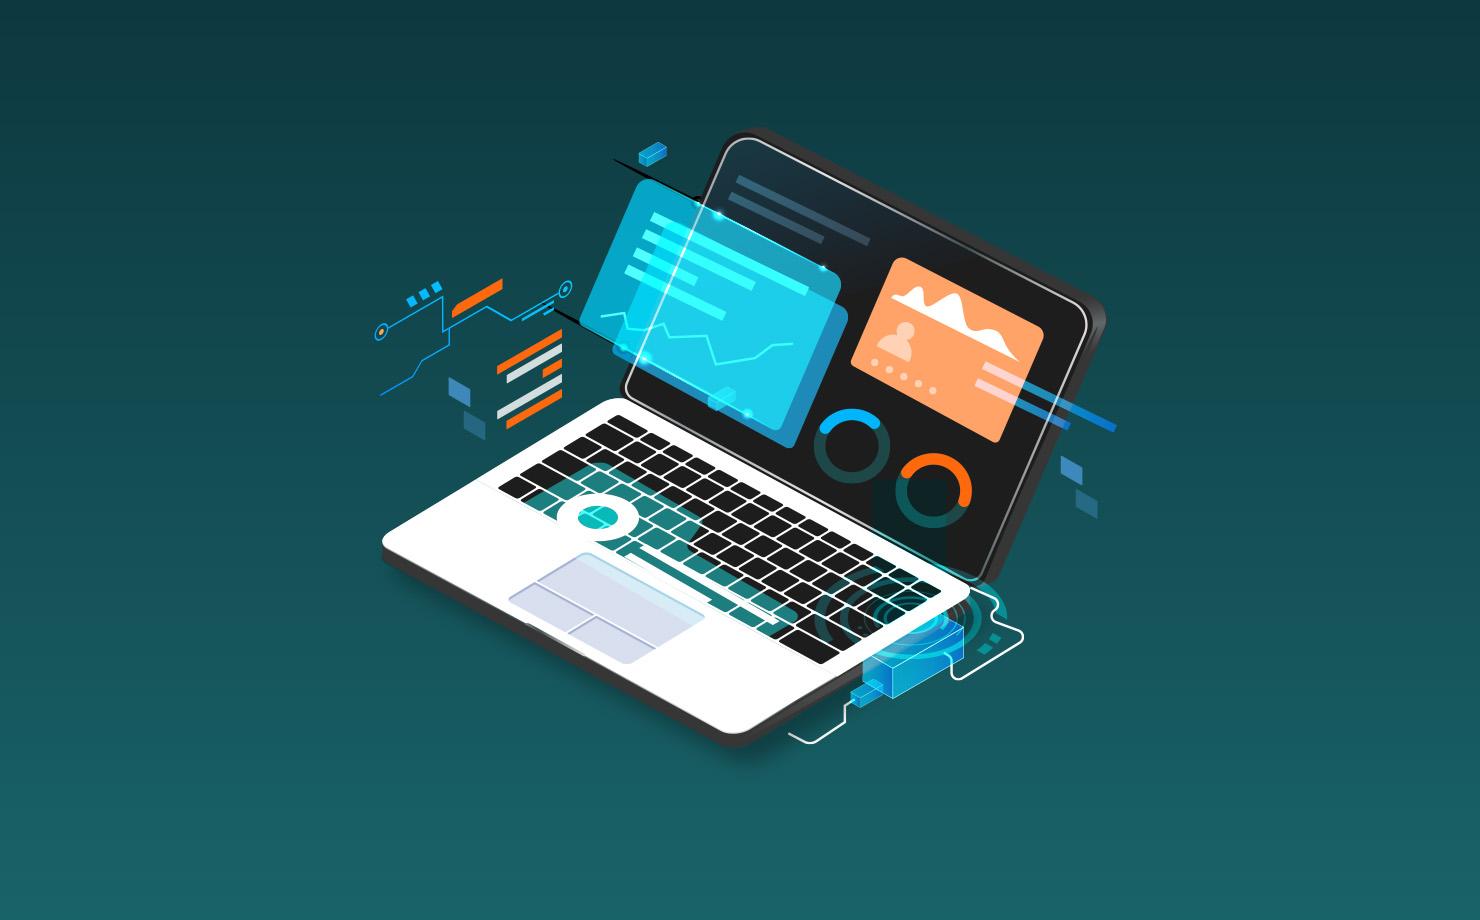 ML in cybersecurity